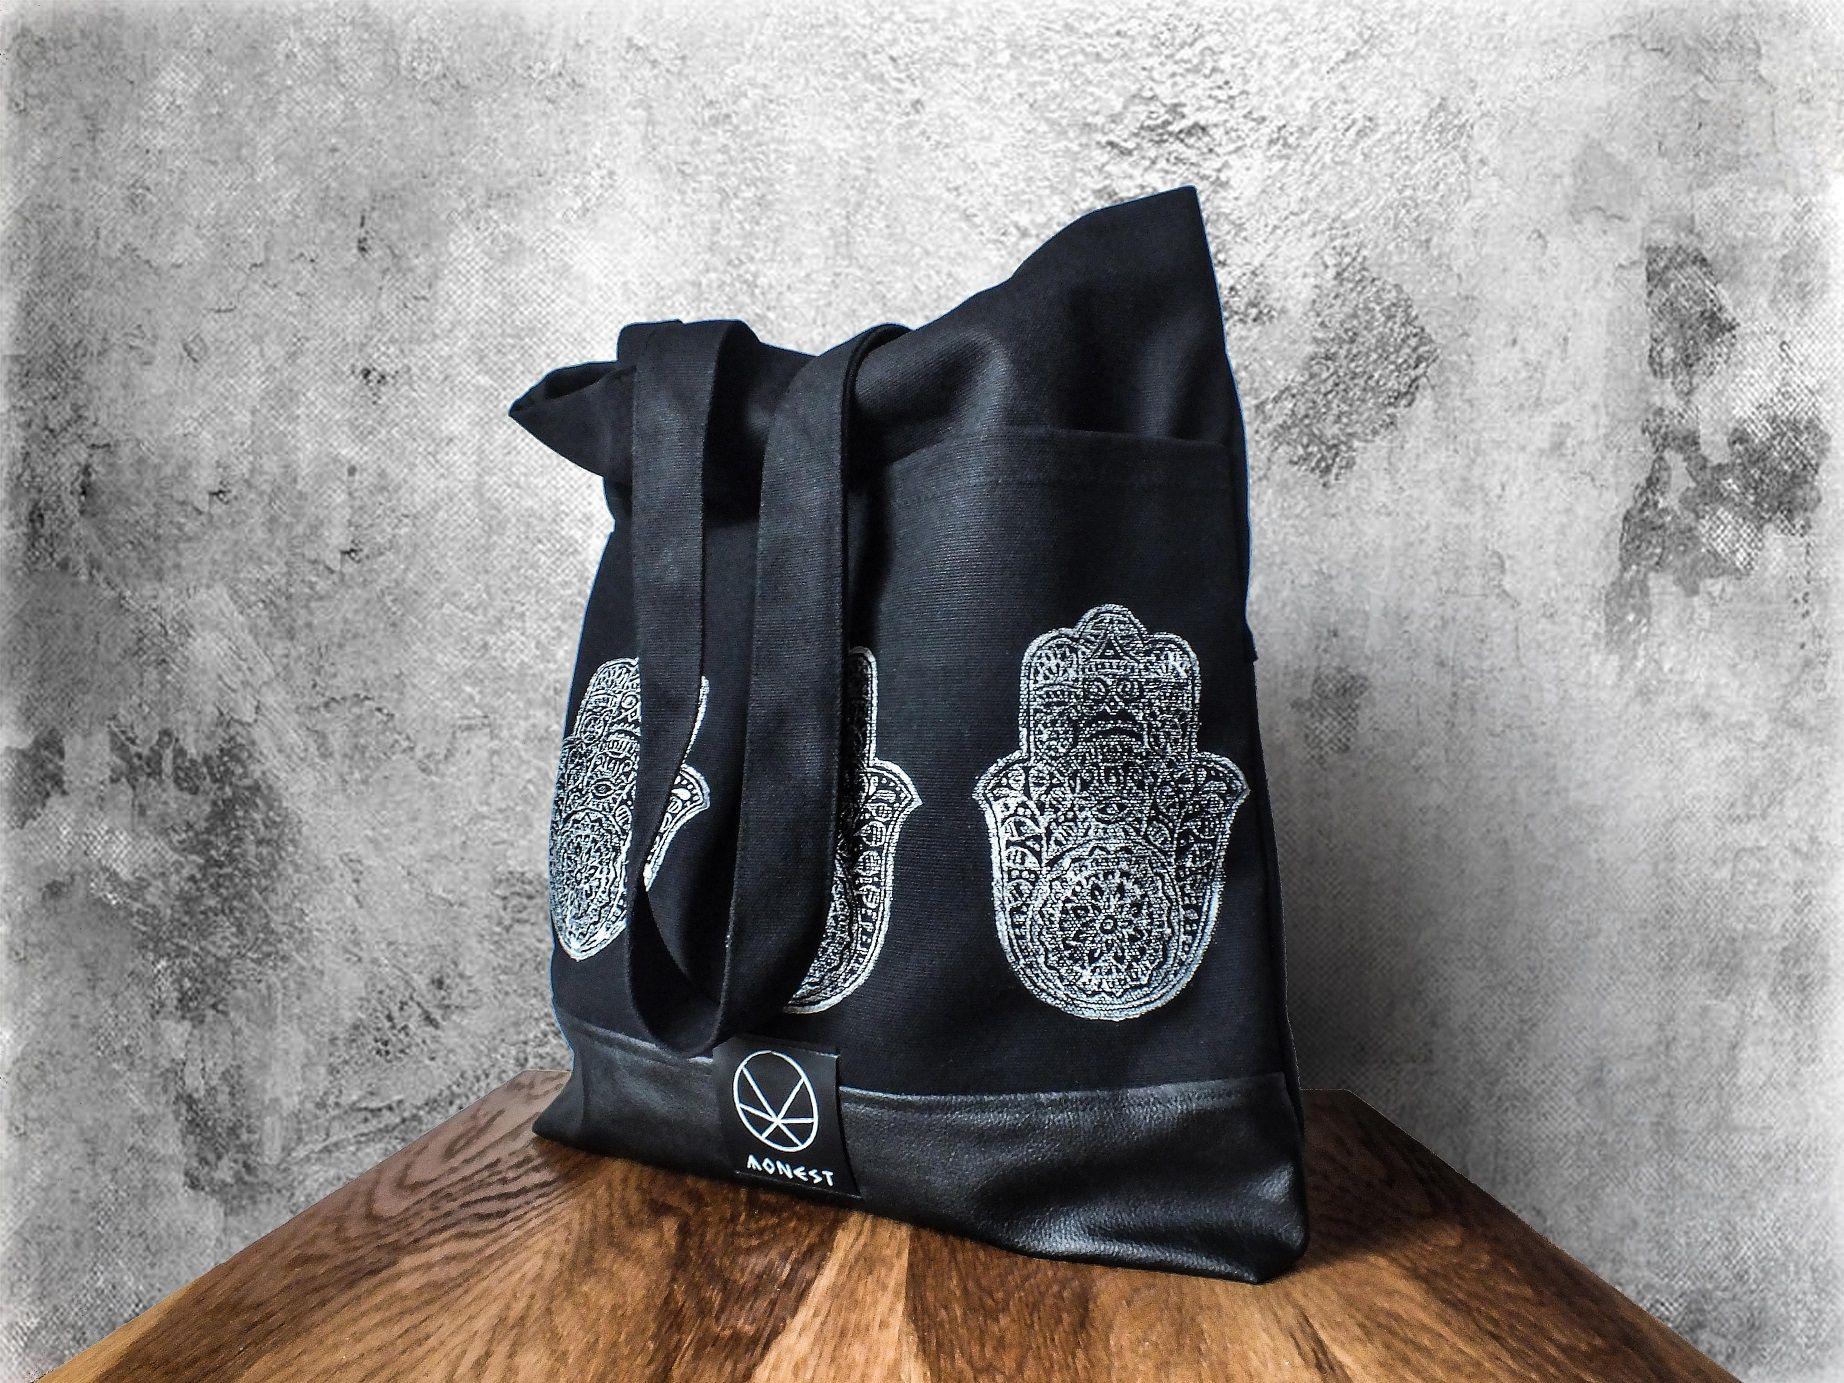 Torba Bawelniana Black Canvas Hamsa Hamsa Black Canvas Cotton Bag